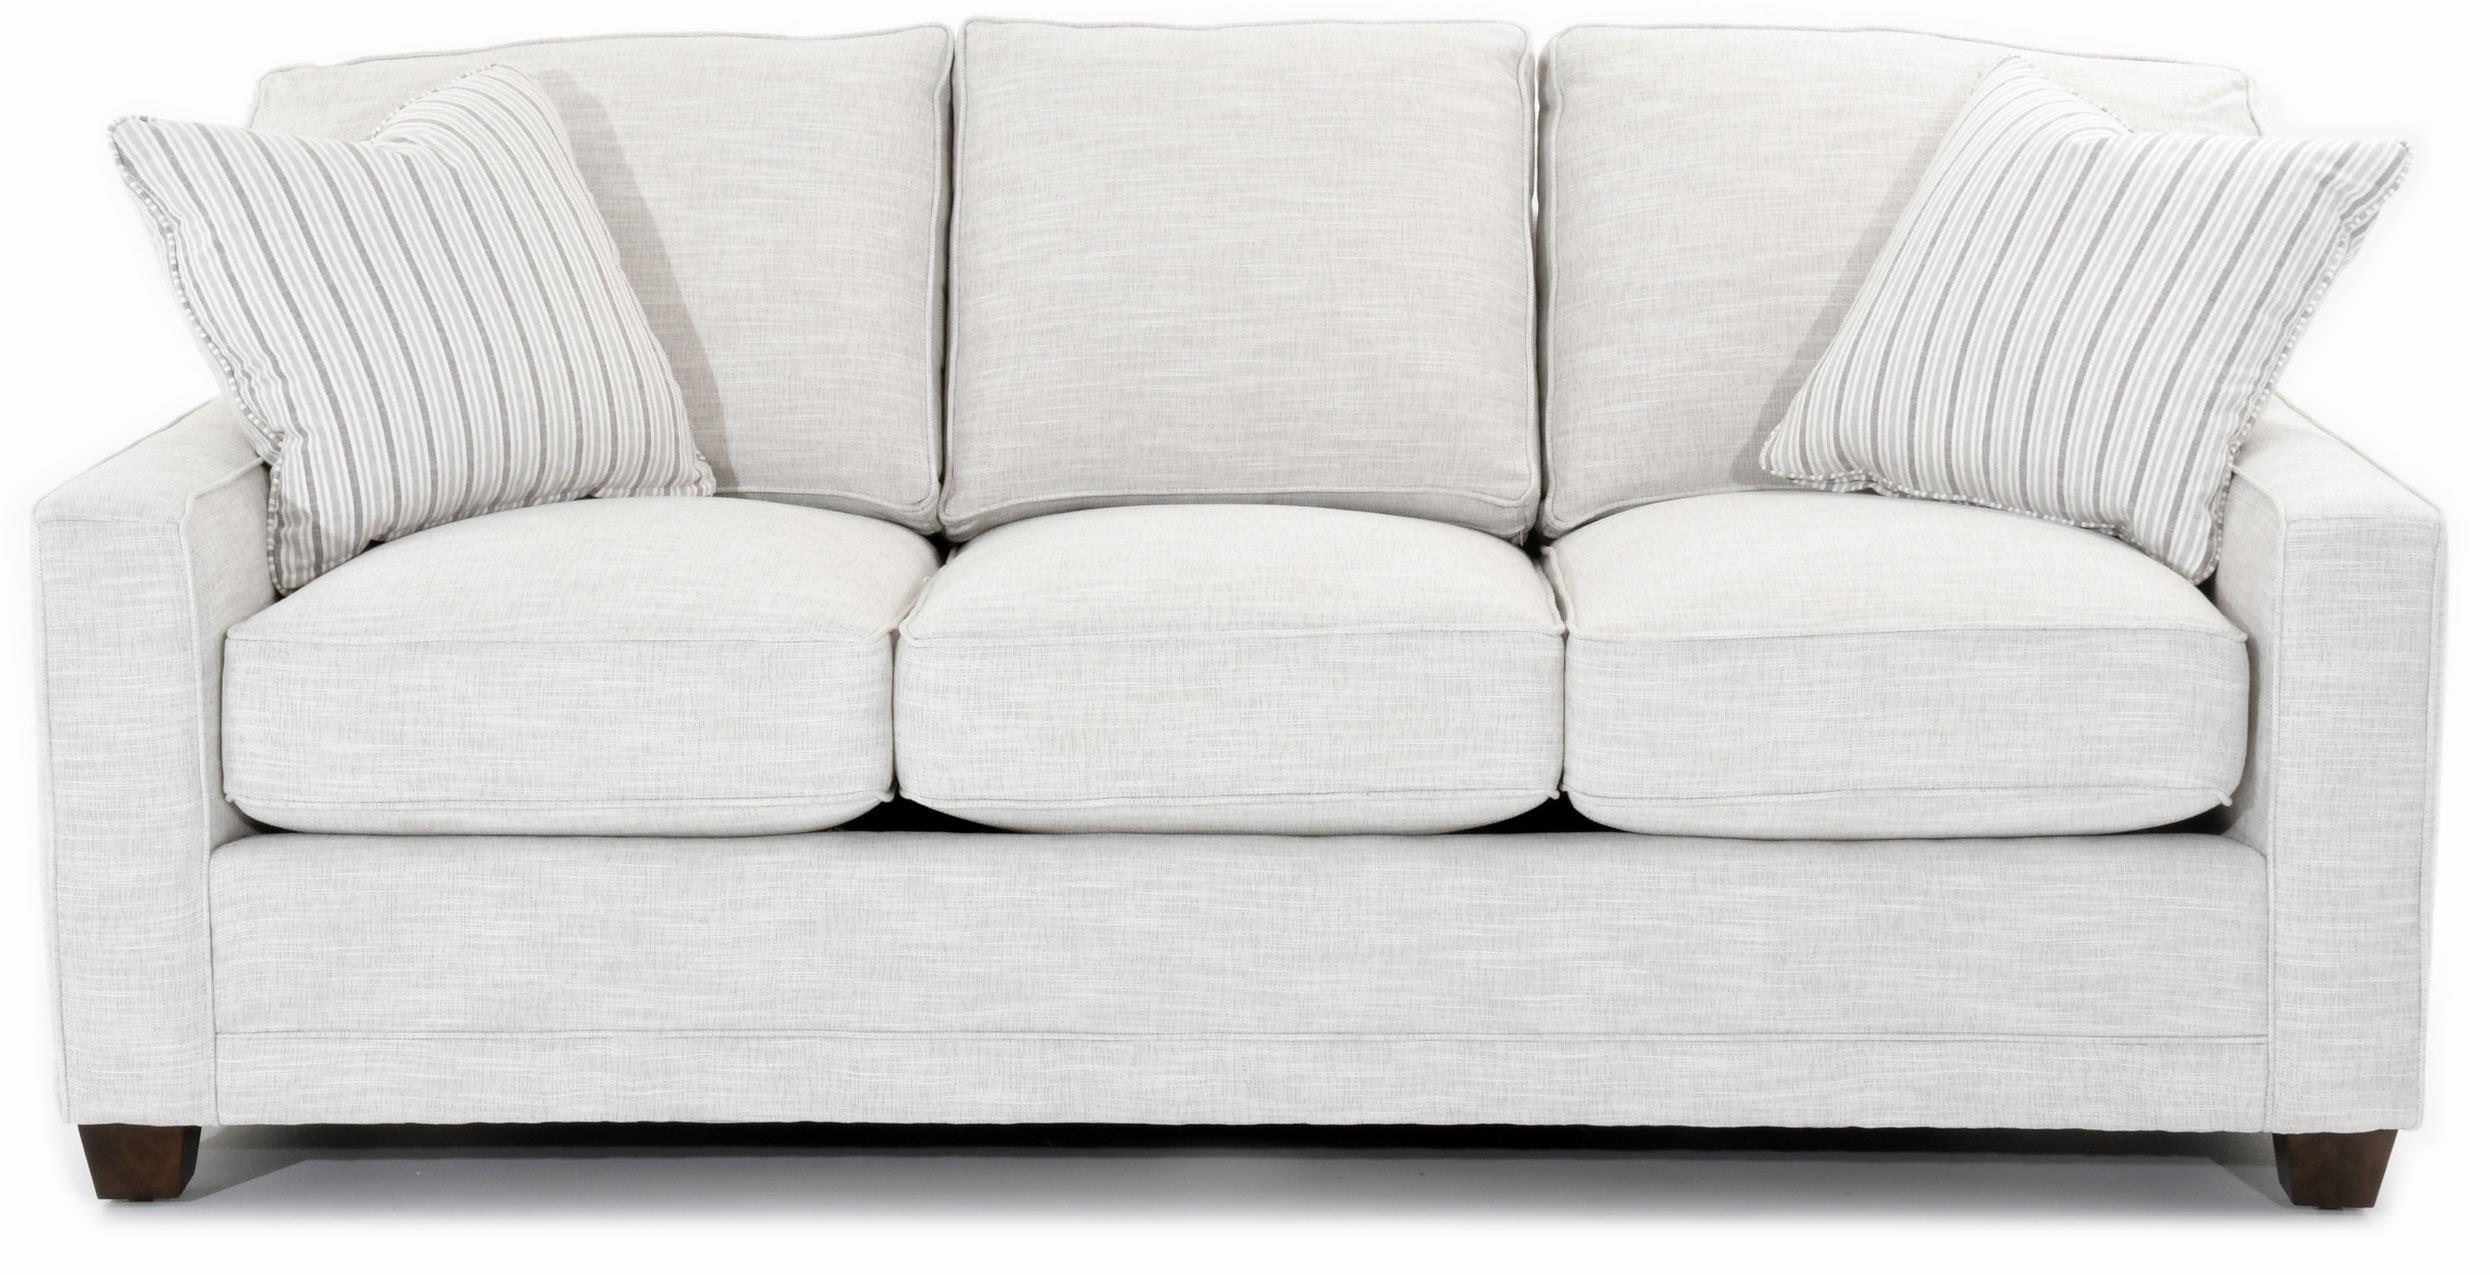 My Style I Customizable Sofa Sleeper by Rowe at Baer's Furniture